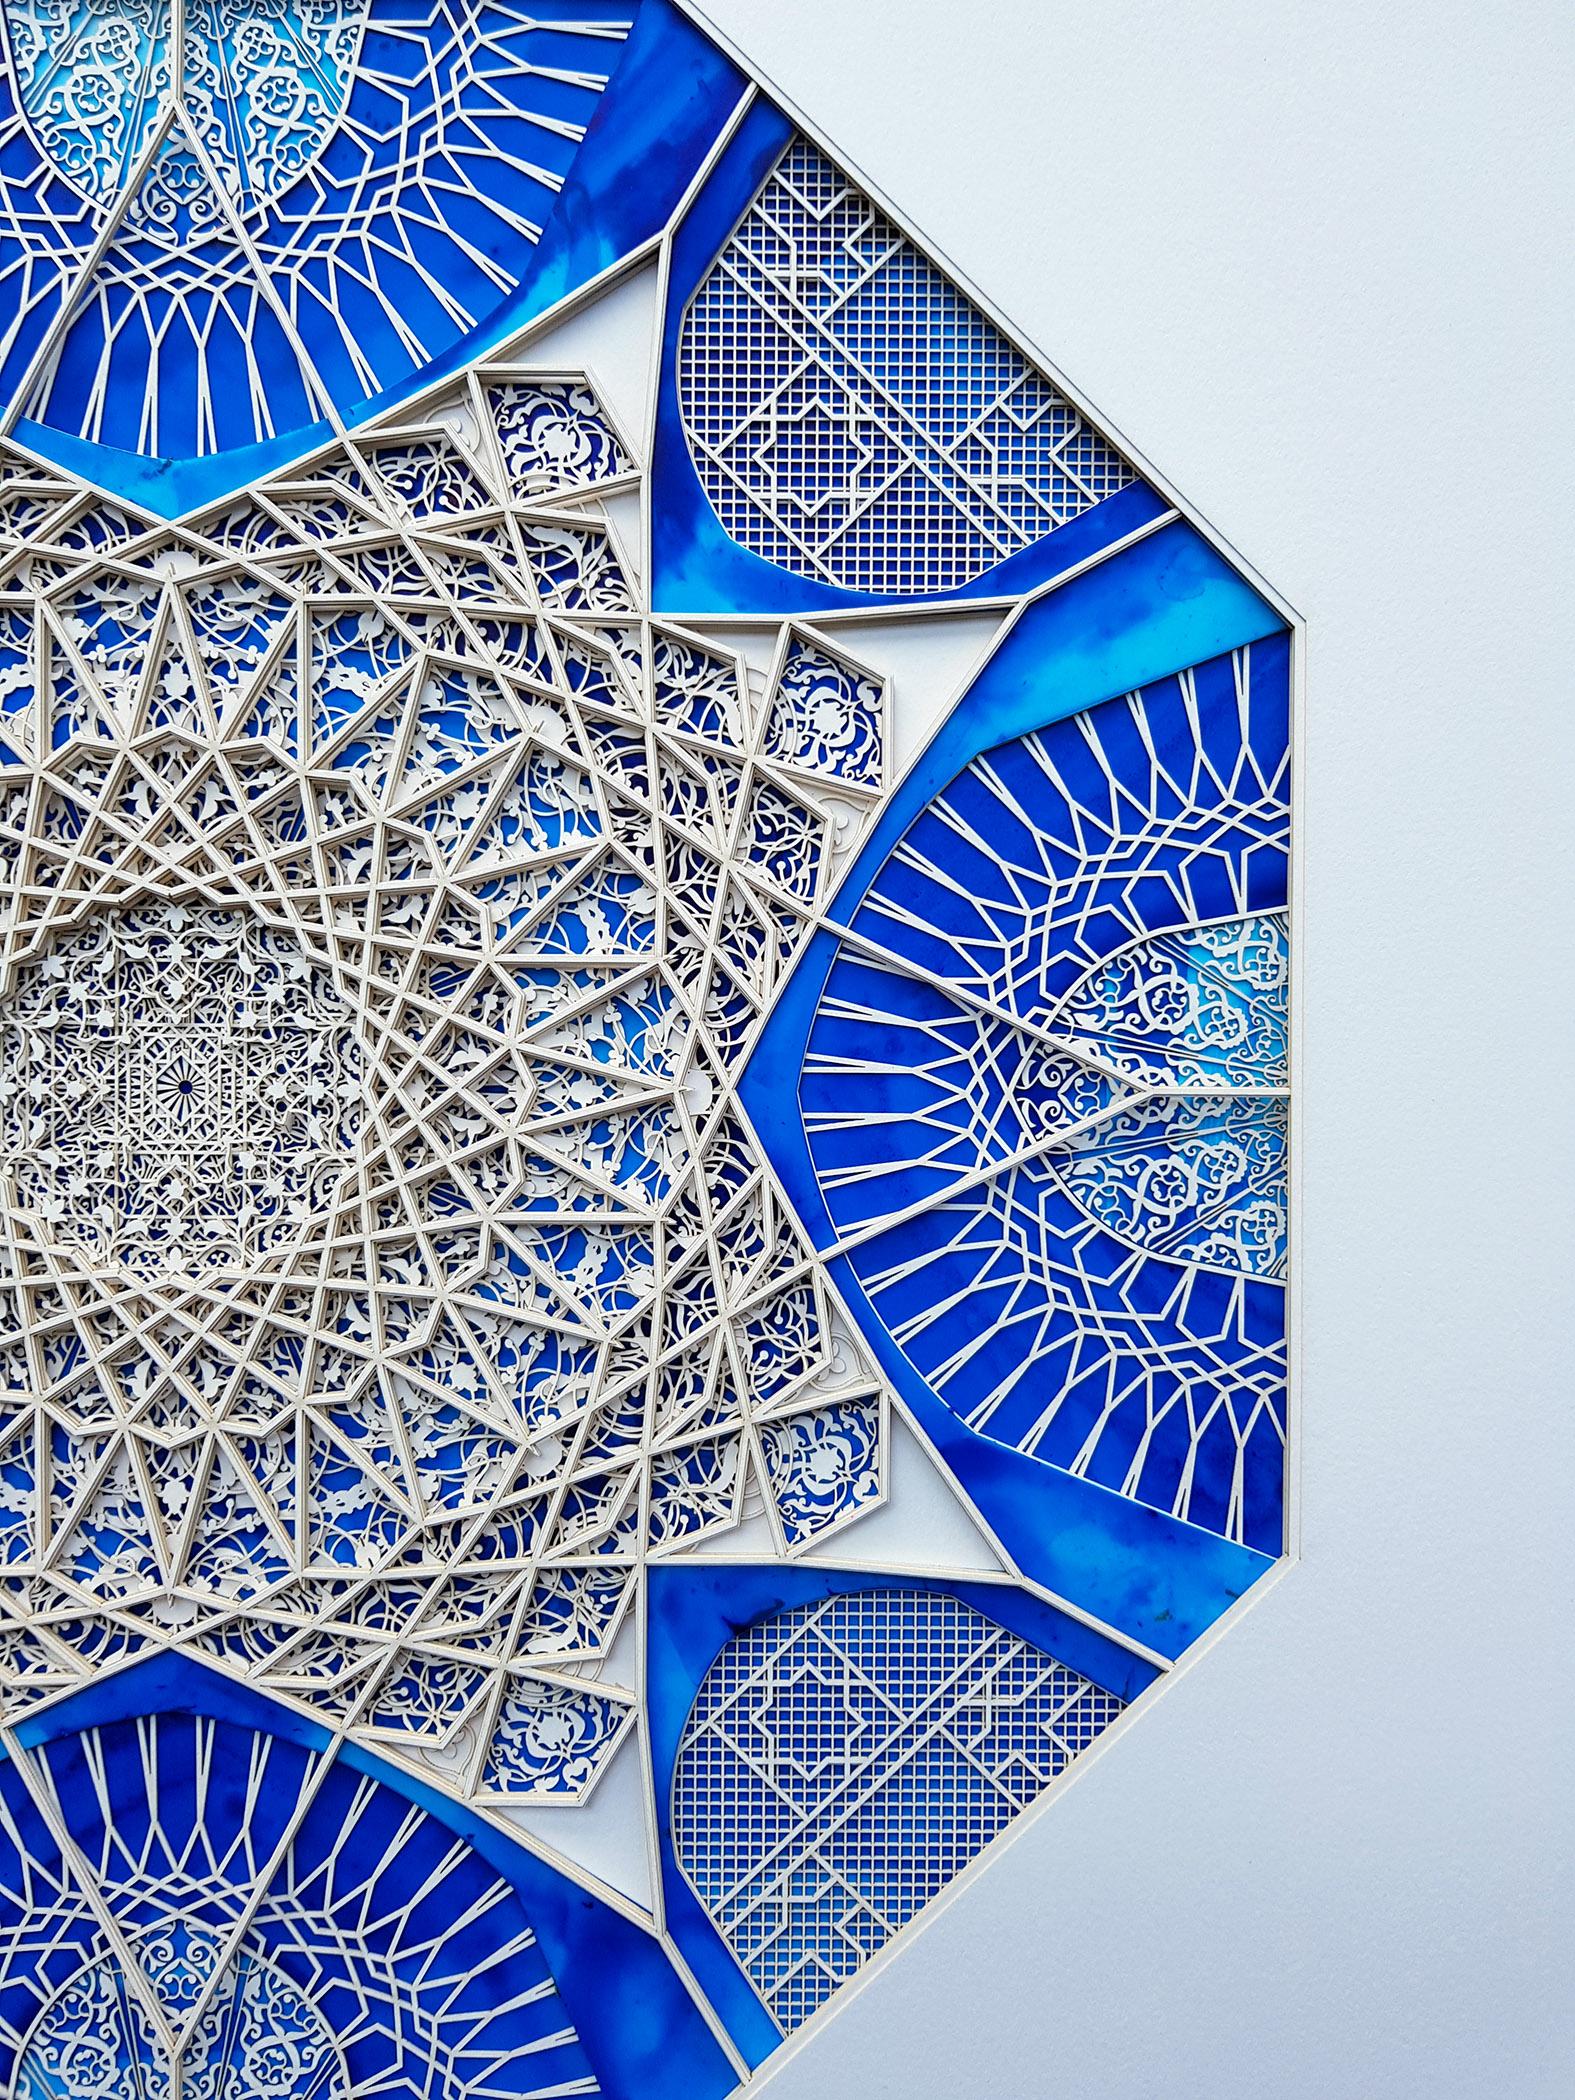 Julia Ibbini (Detail Shot) - Untitled Study